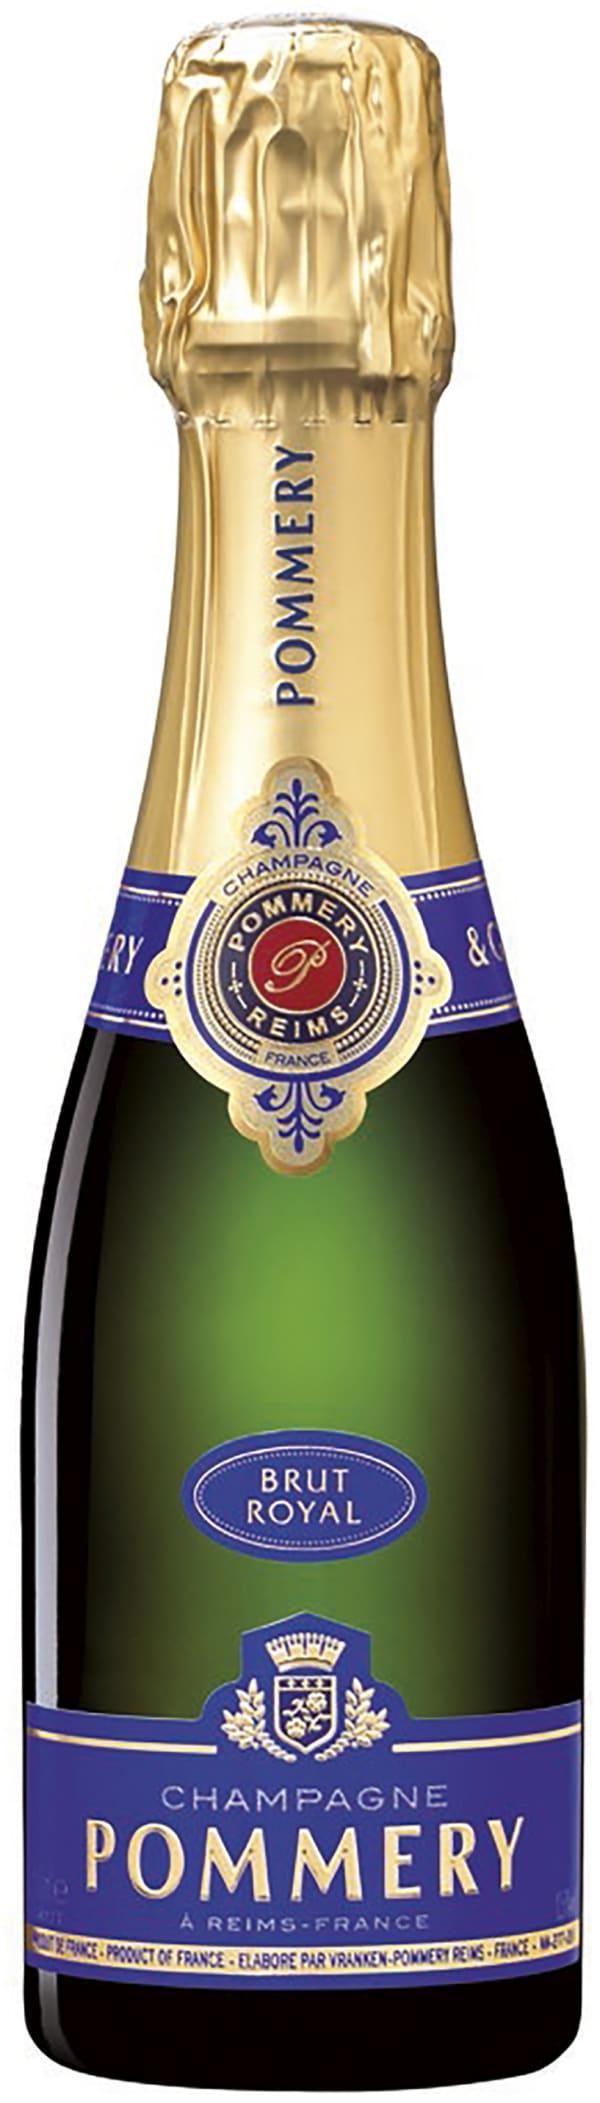 Pommery Royal Champagne Brut